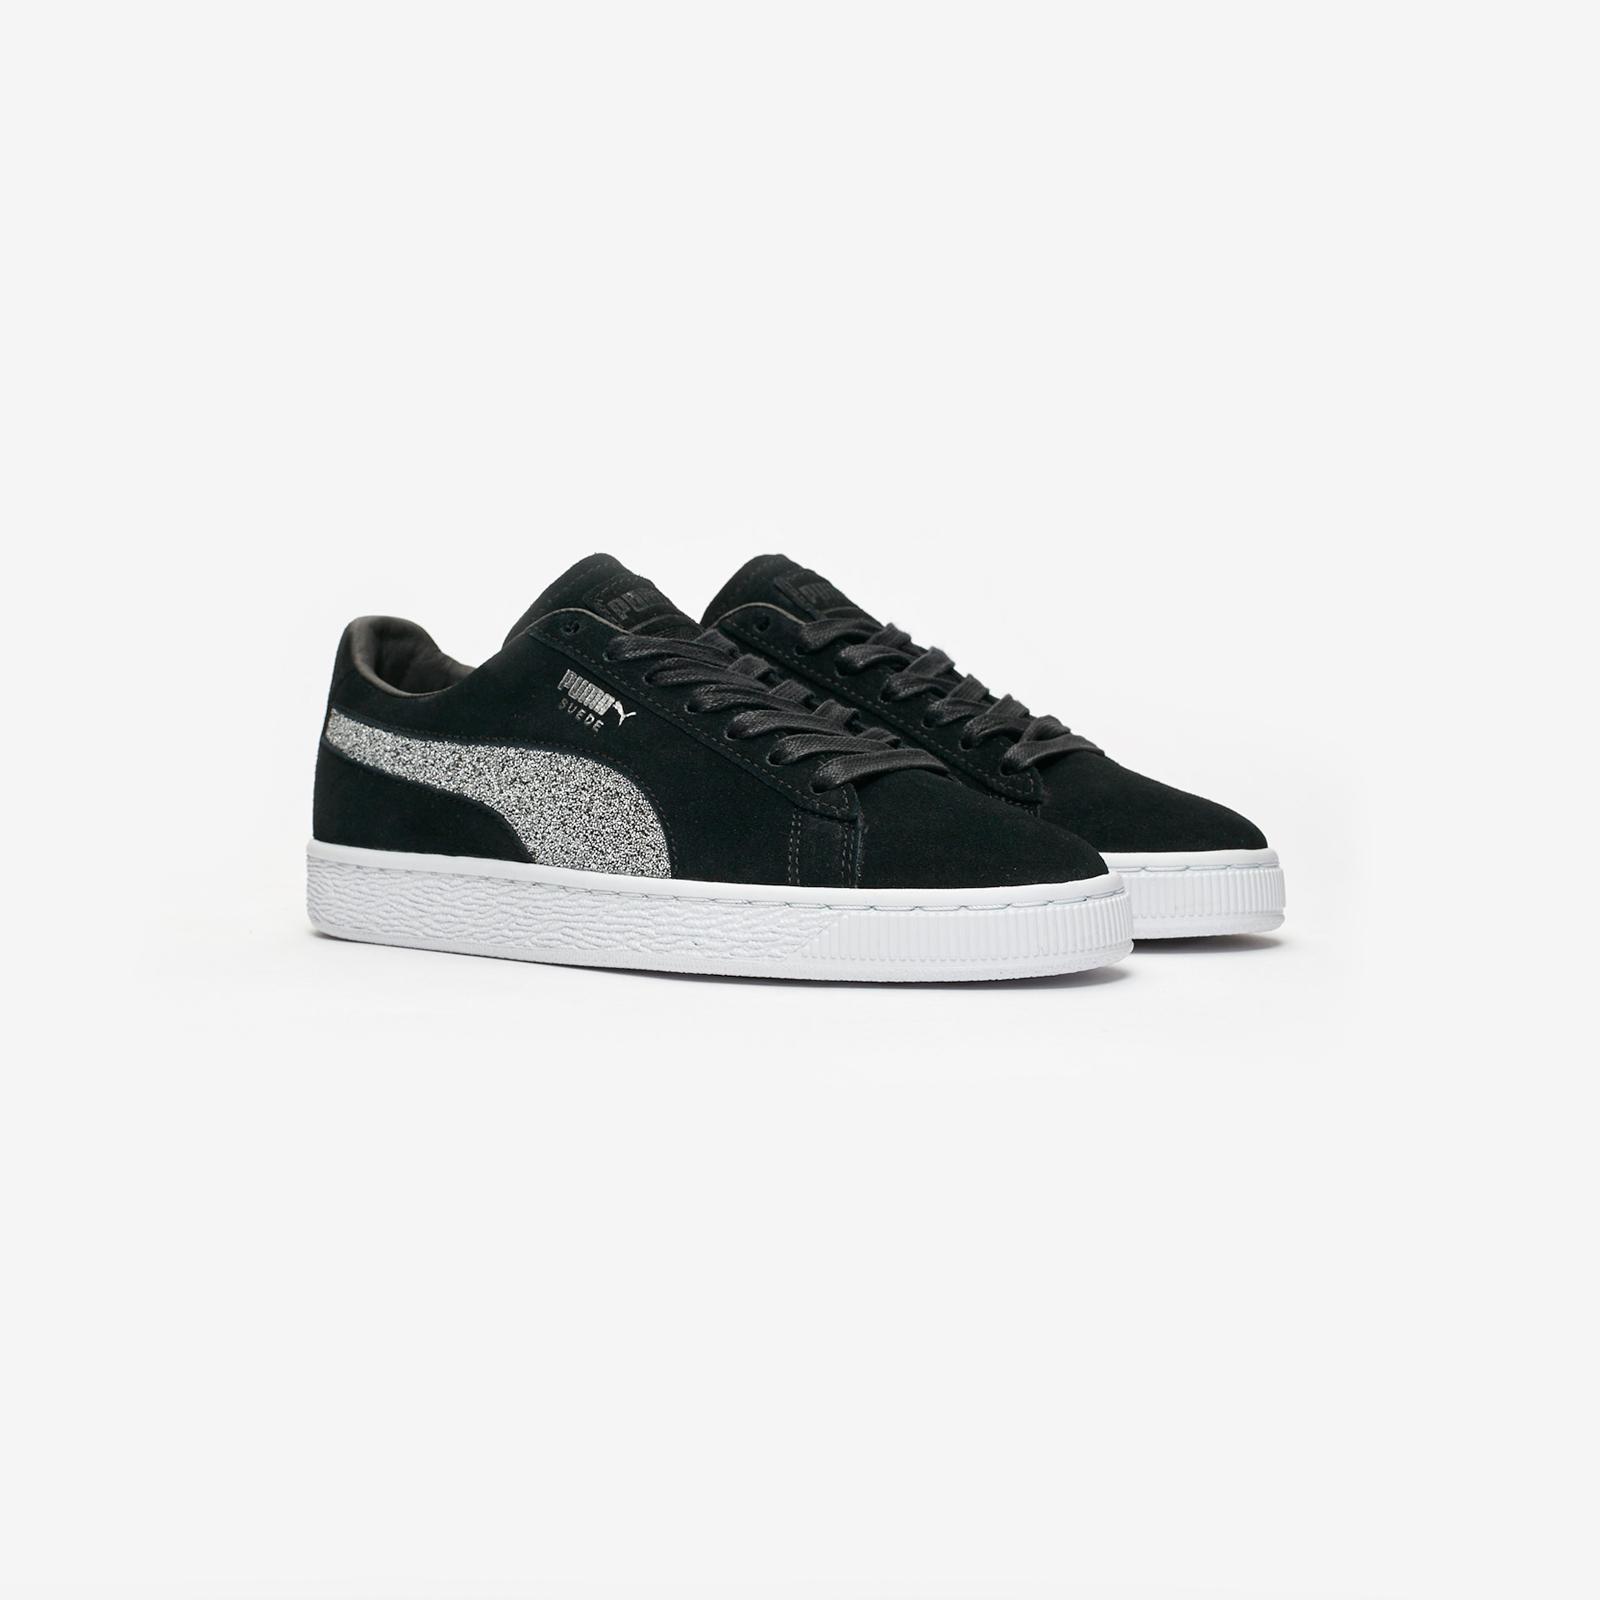 Puma Suede Classic x Swarovski - 366324-01 - Sneakersnstuff ... 2a398f346